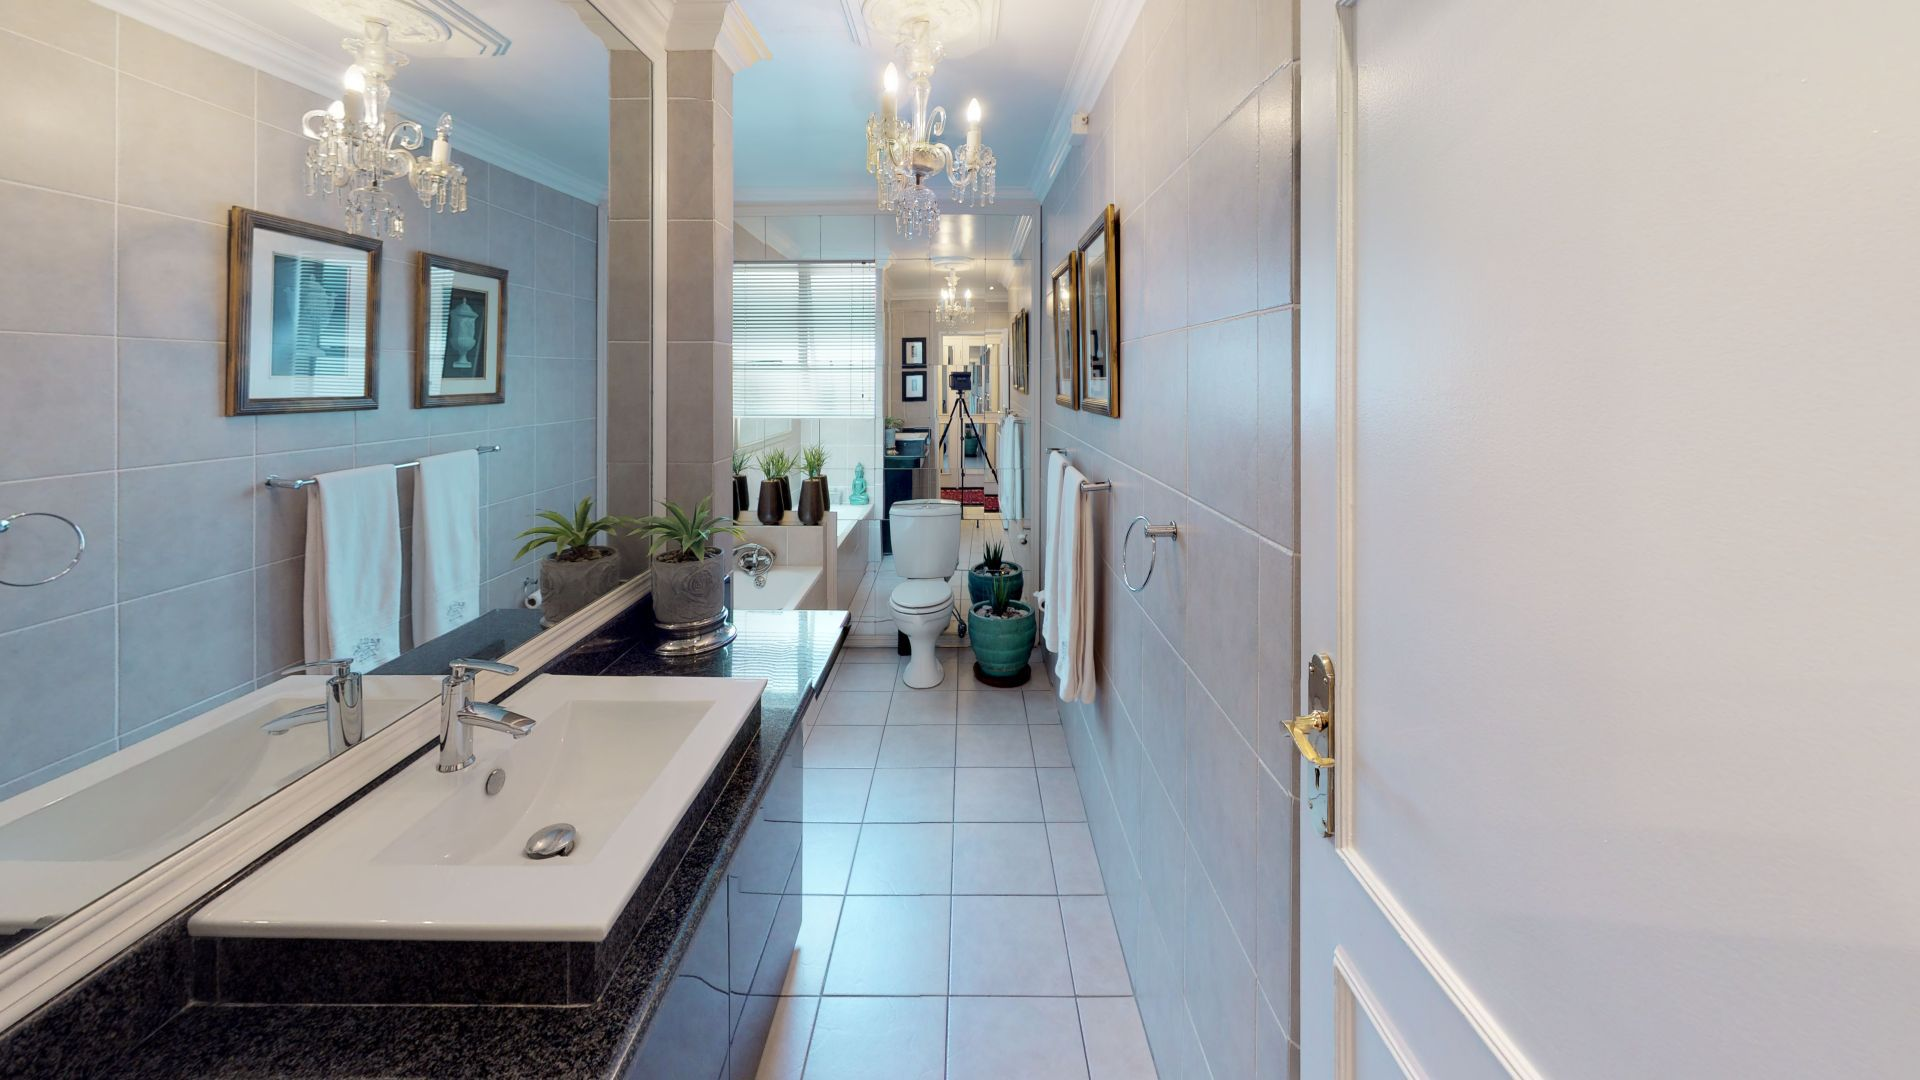 6-Lymington-Mews-Bathroom.jpg